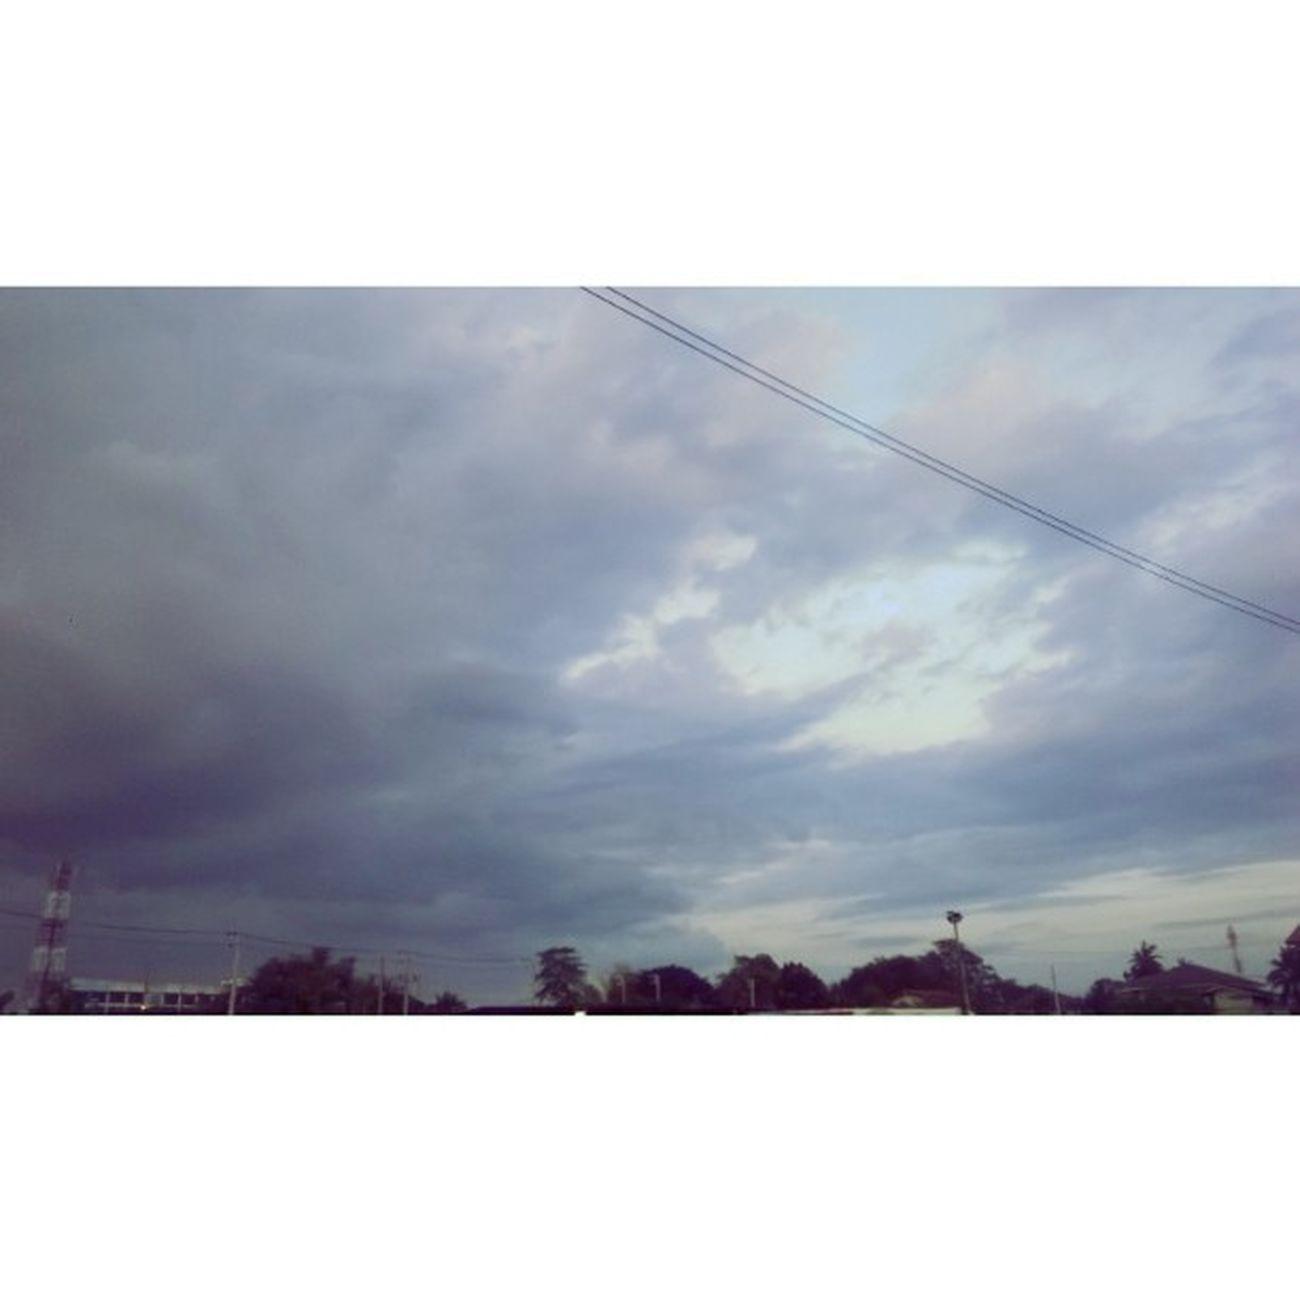 Rain ☔ Coming☔